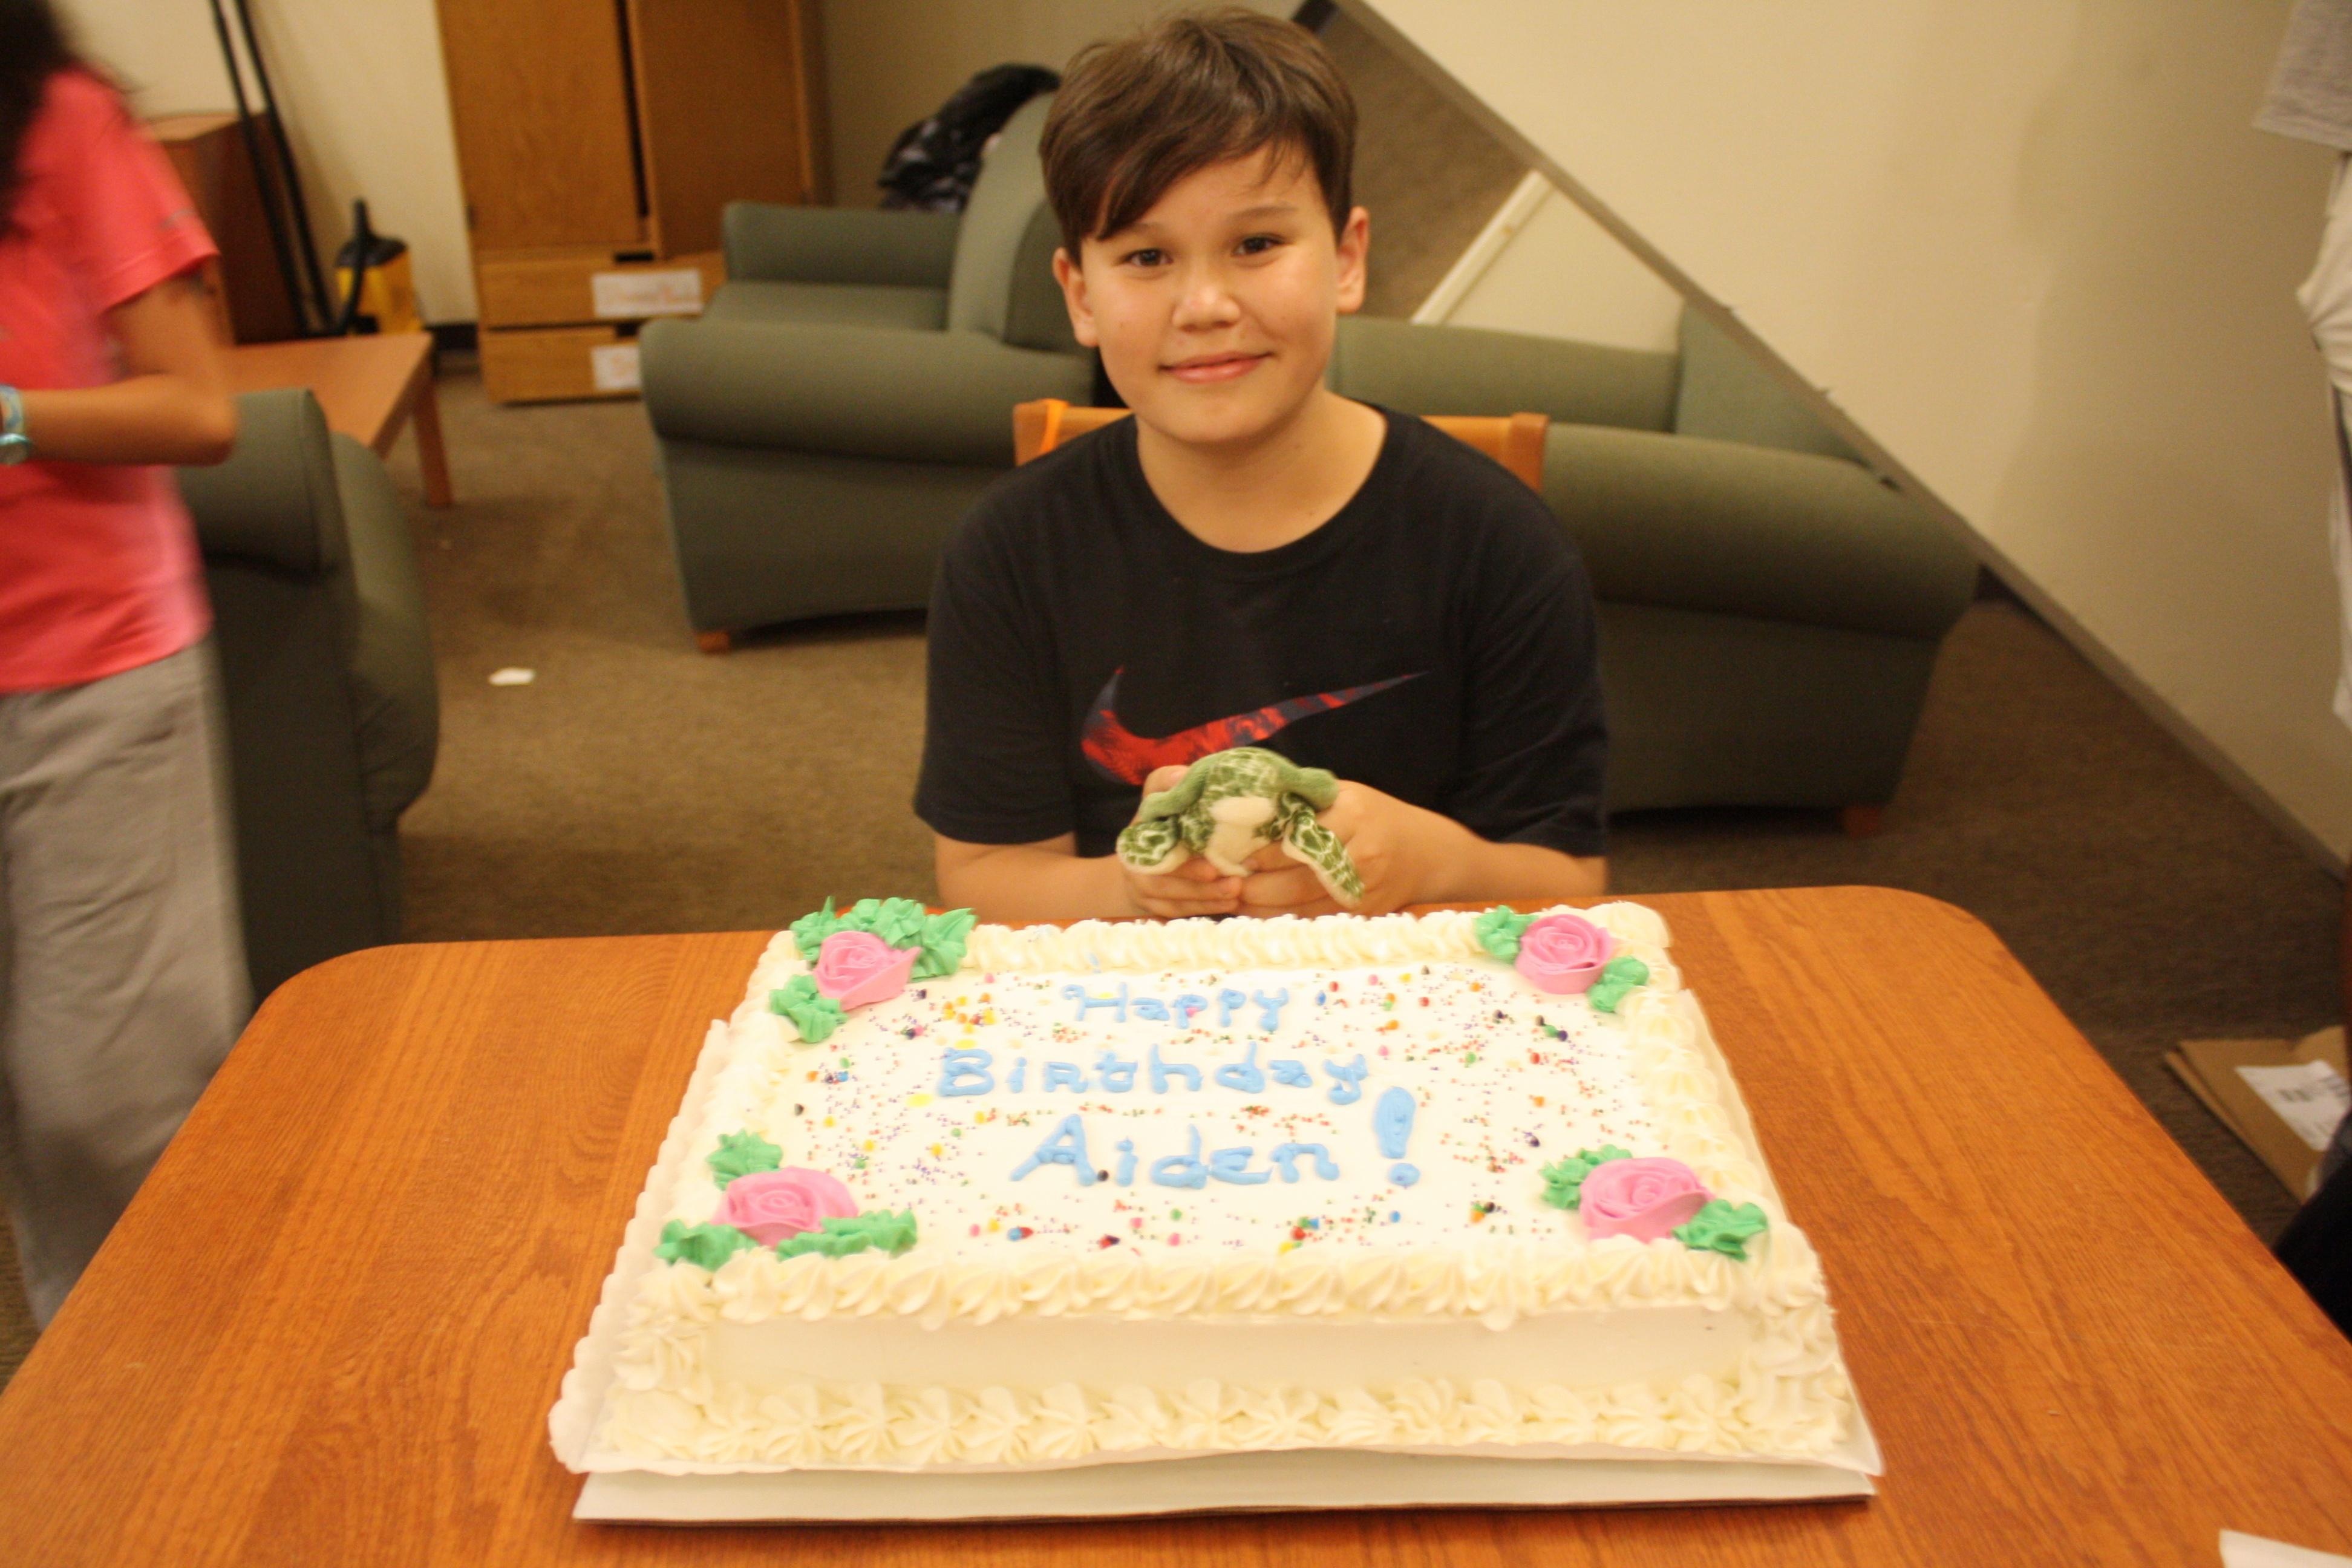 Aidan enjoying his summer birthday party in the dorm.